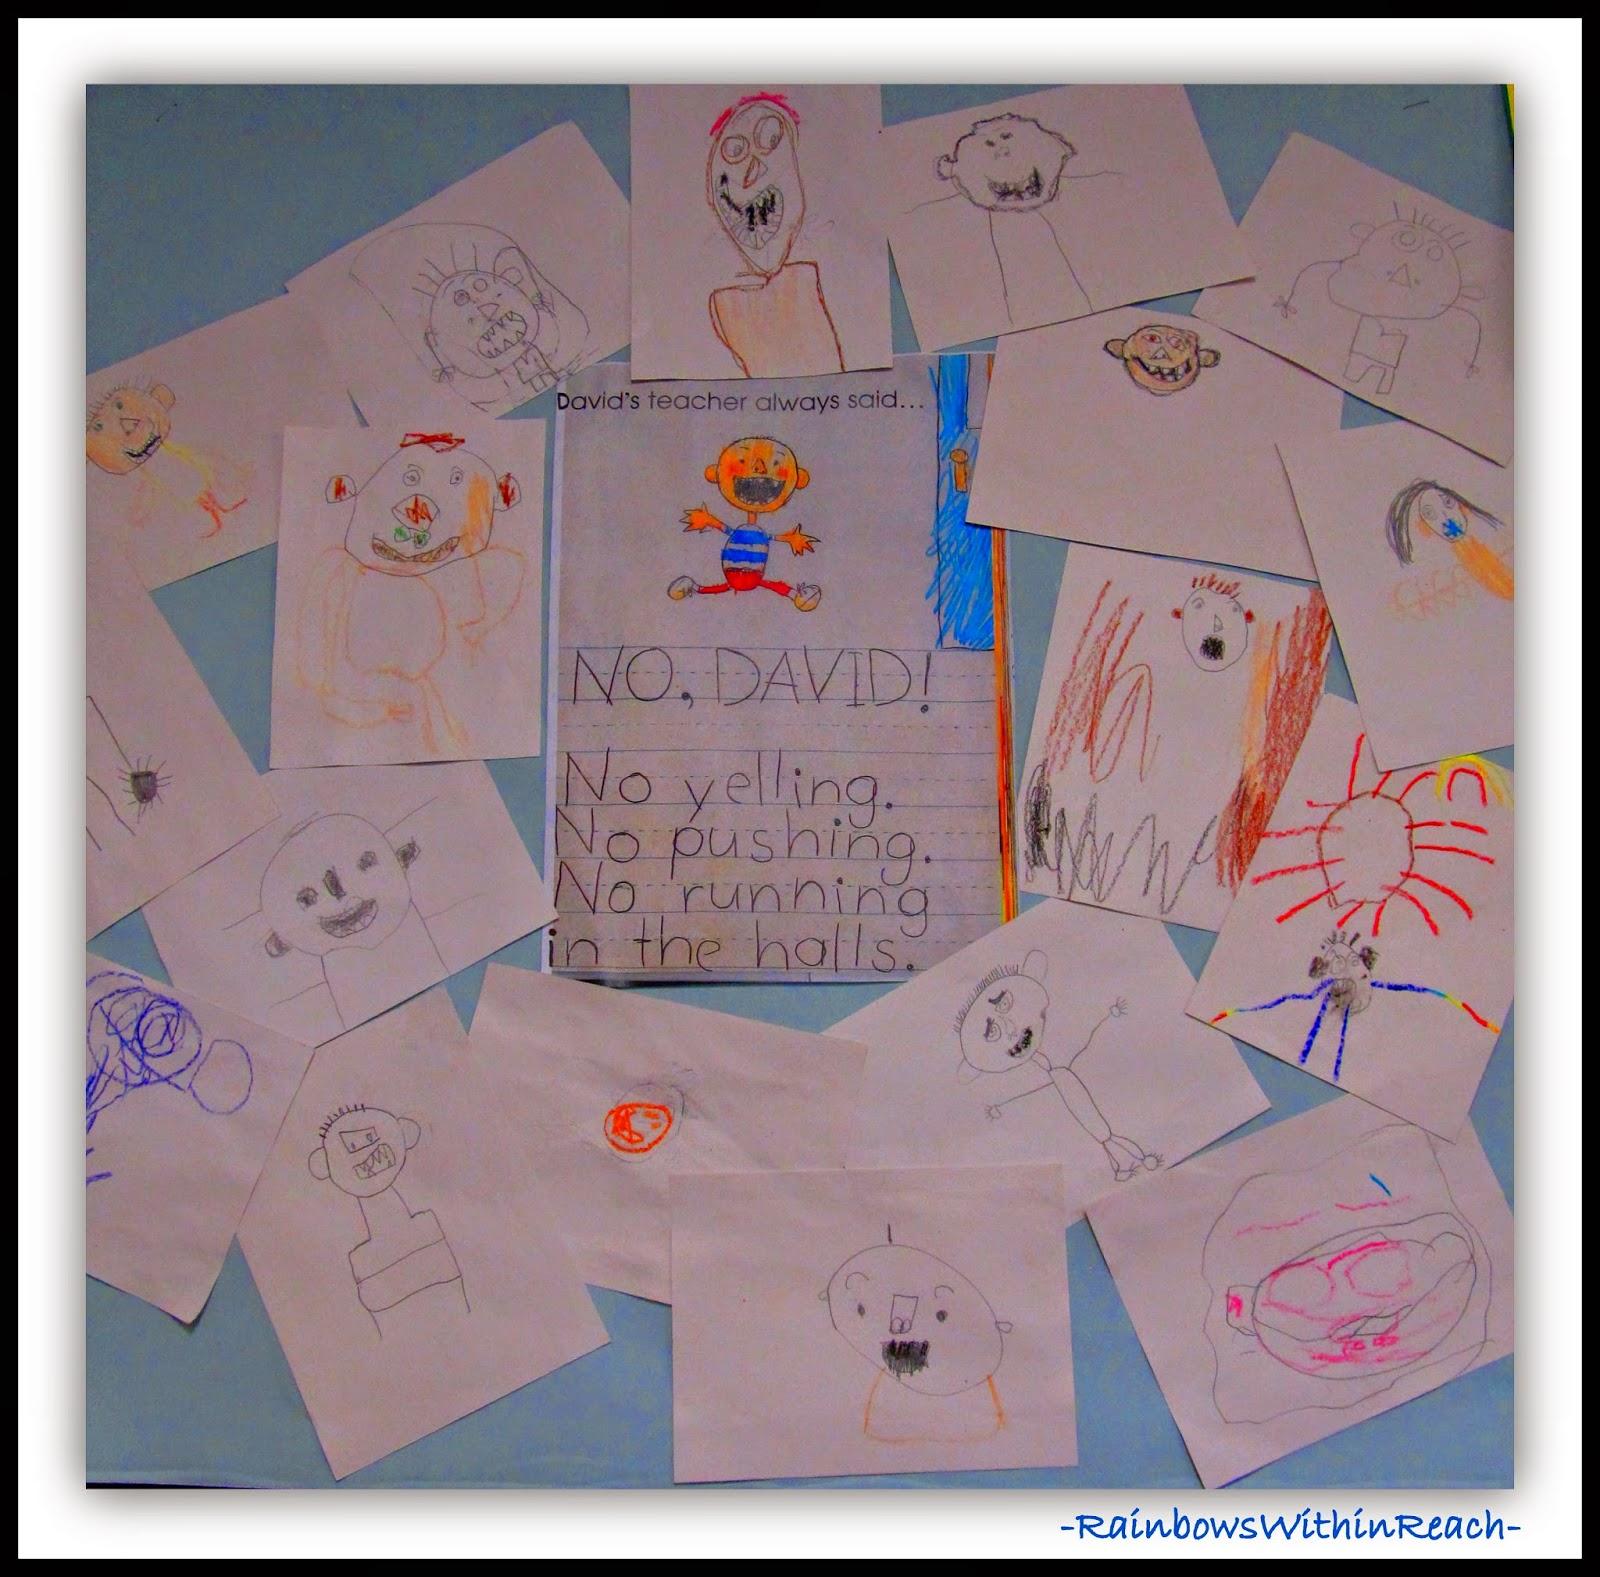 """No David!"" Anchor Chart for School Behaviors + Expectations at RainbowsWithinReach"